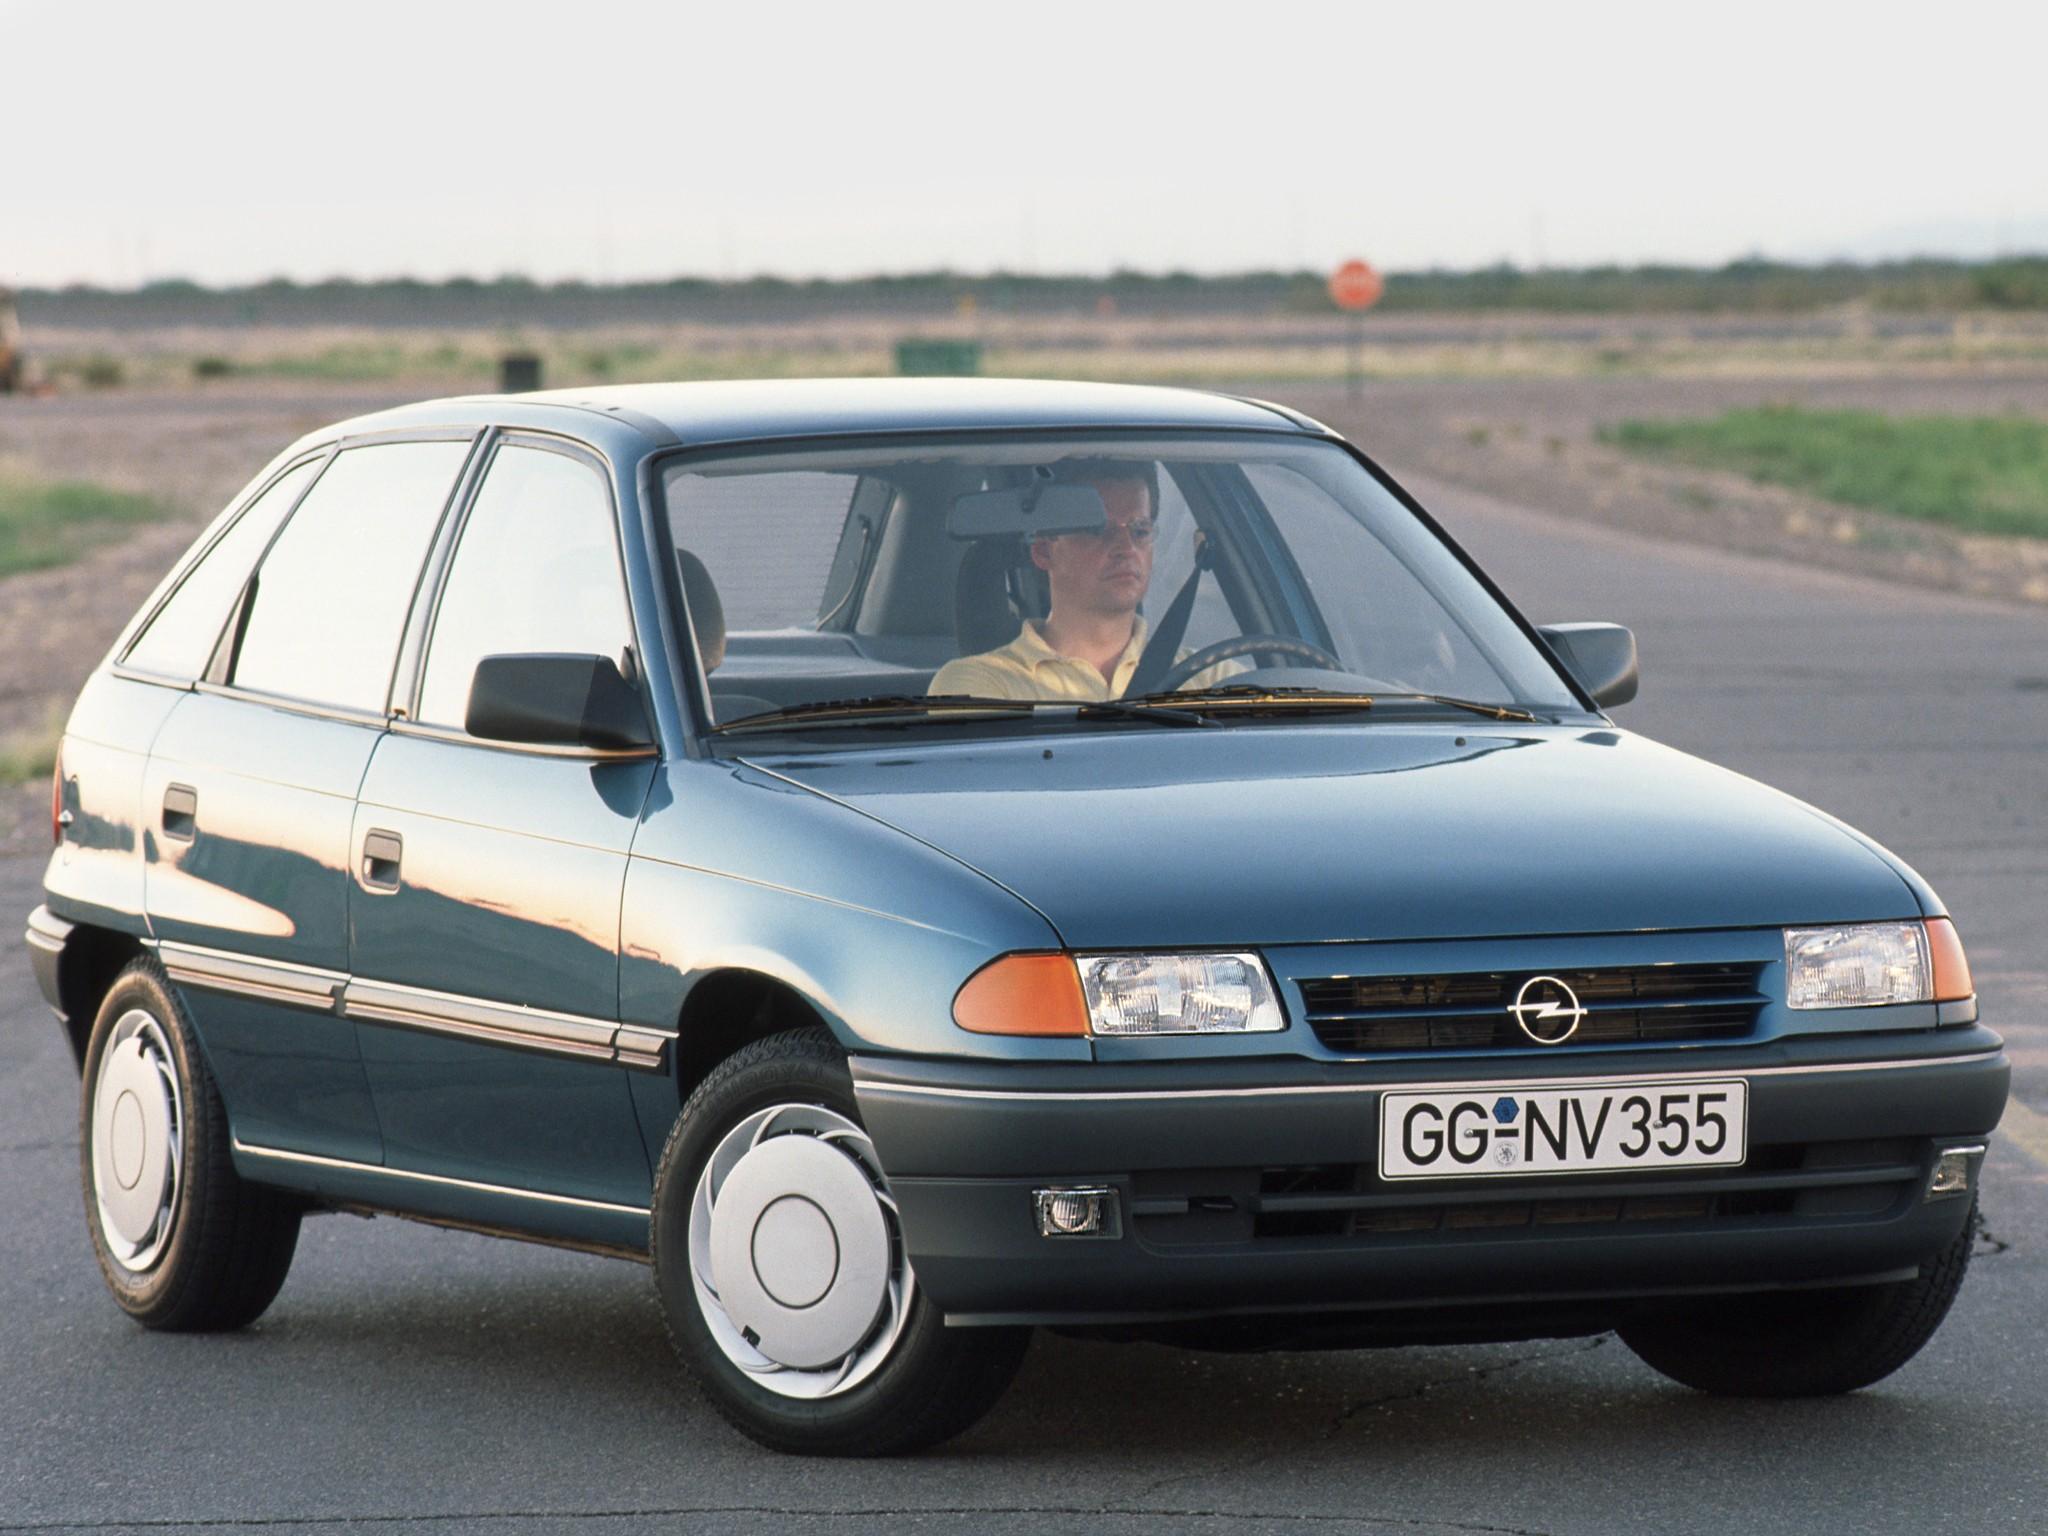 opel astra 5 doors specs 1991 1992 1993 1994 autoevolution. Black Bedroom Furniture Sets. Home Design Ideas